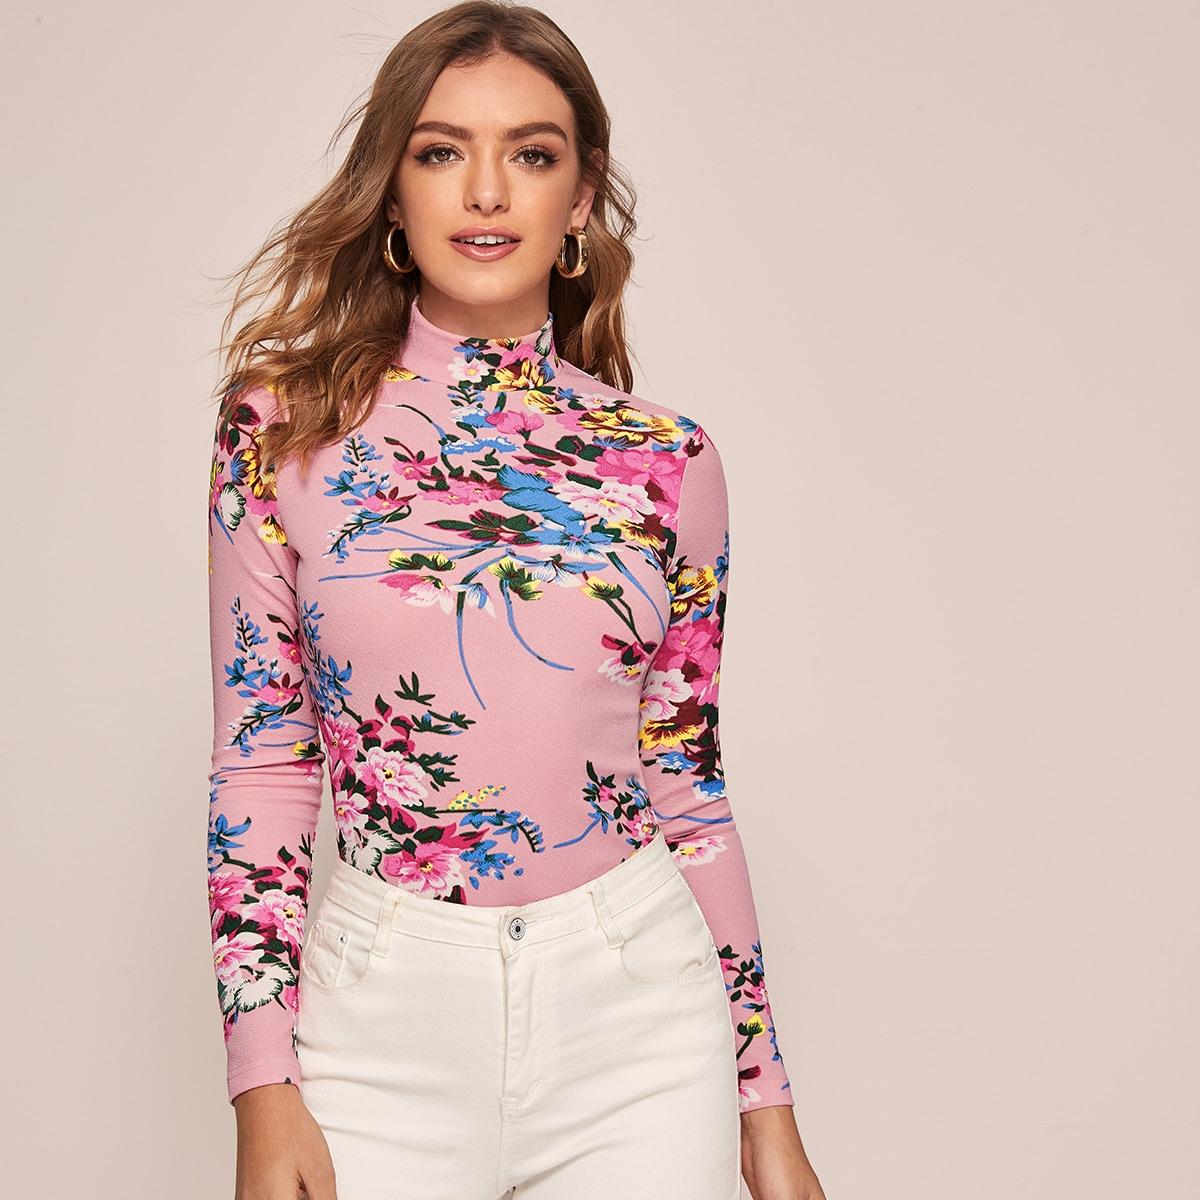 SHEIN / Camiseta con estampado botánico de cuello alzado